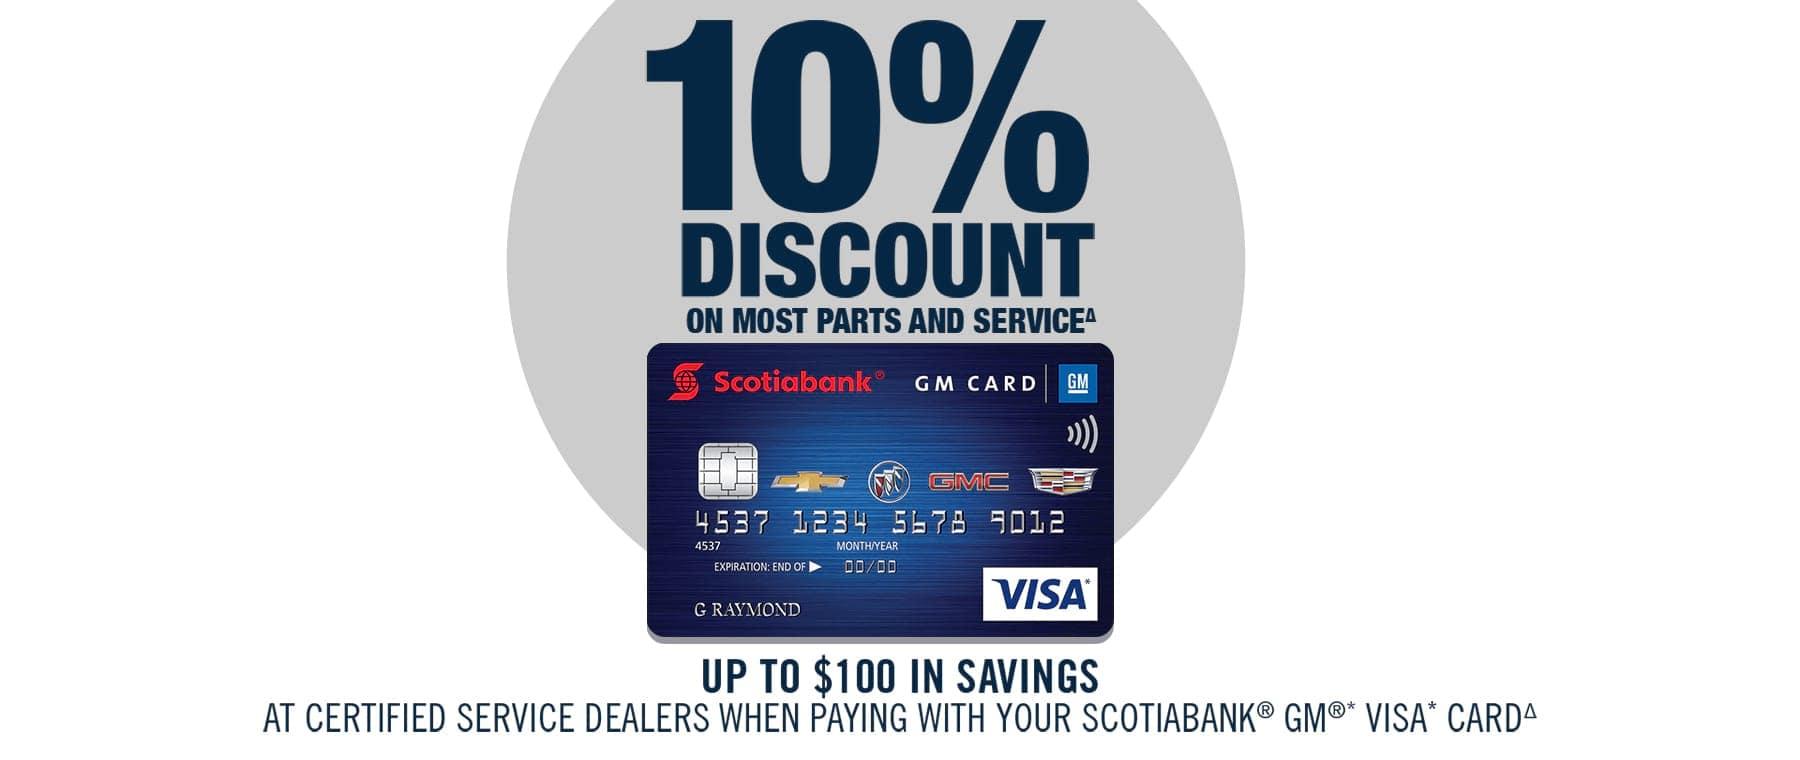 GM VISA Card 10 Percent Discount On Most Parts & Service